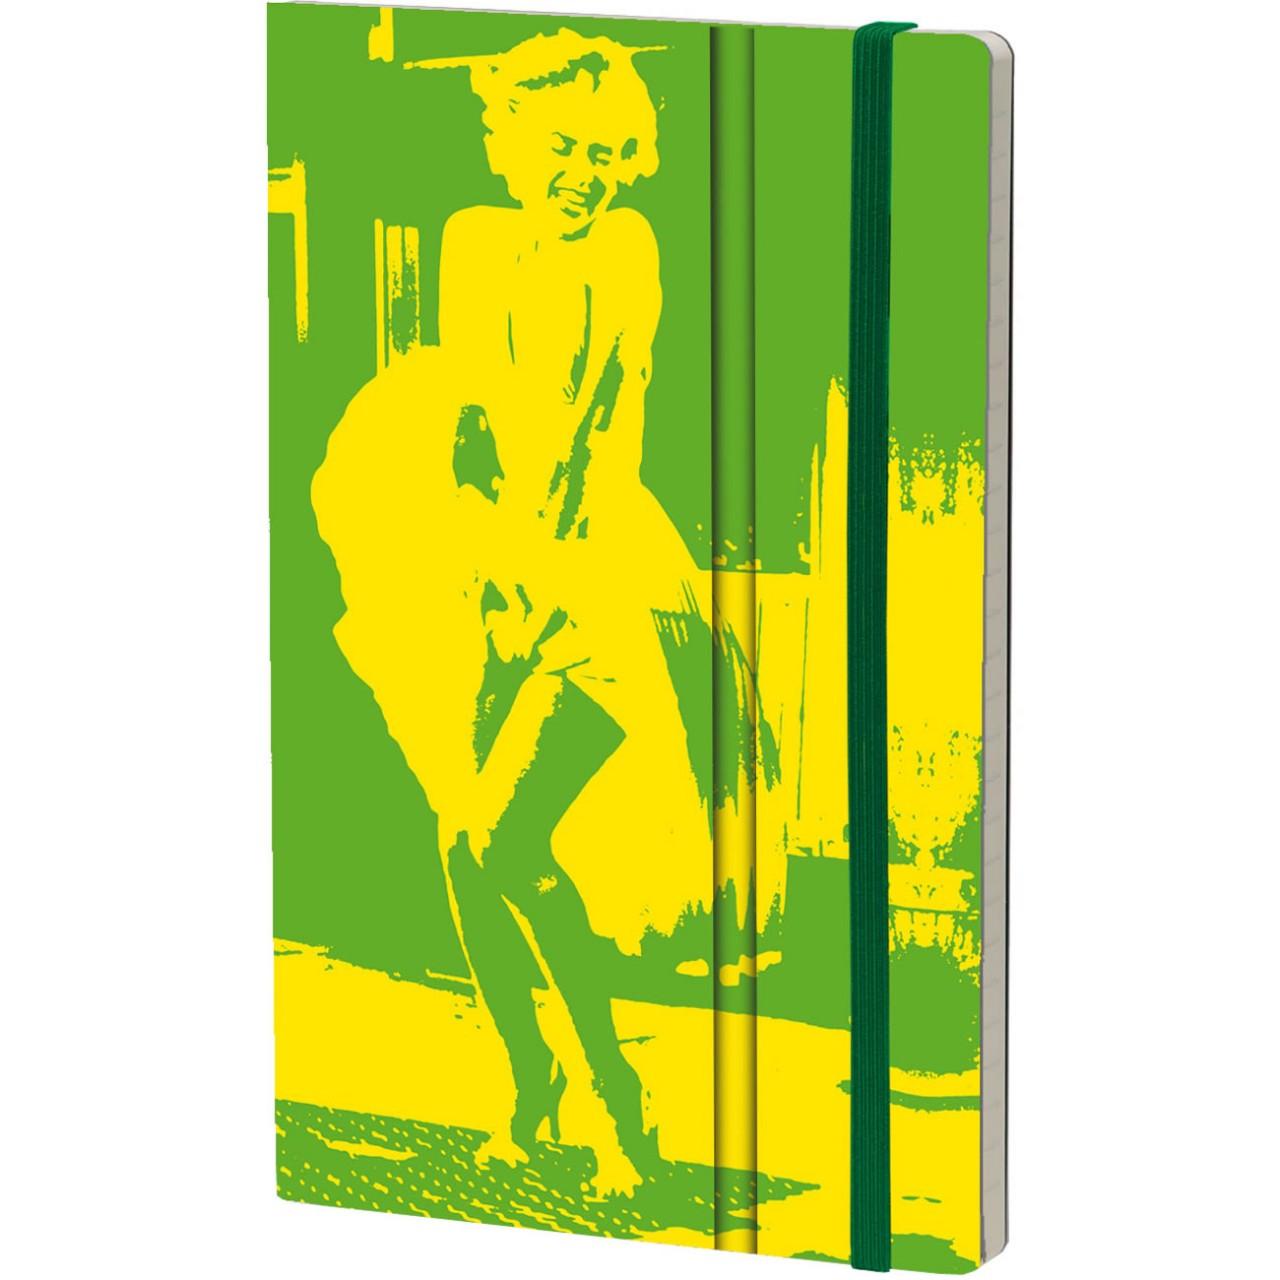 Stifflexible Notizbuch FLUO MARILYNN 13 x 21 cm 192 S., YELLOW-GREEN